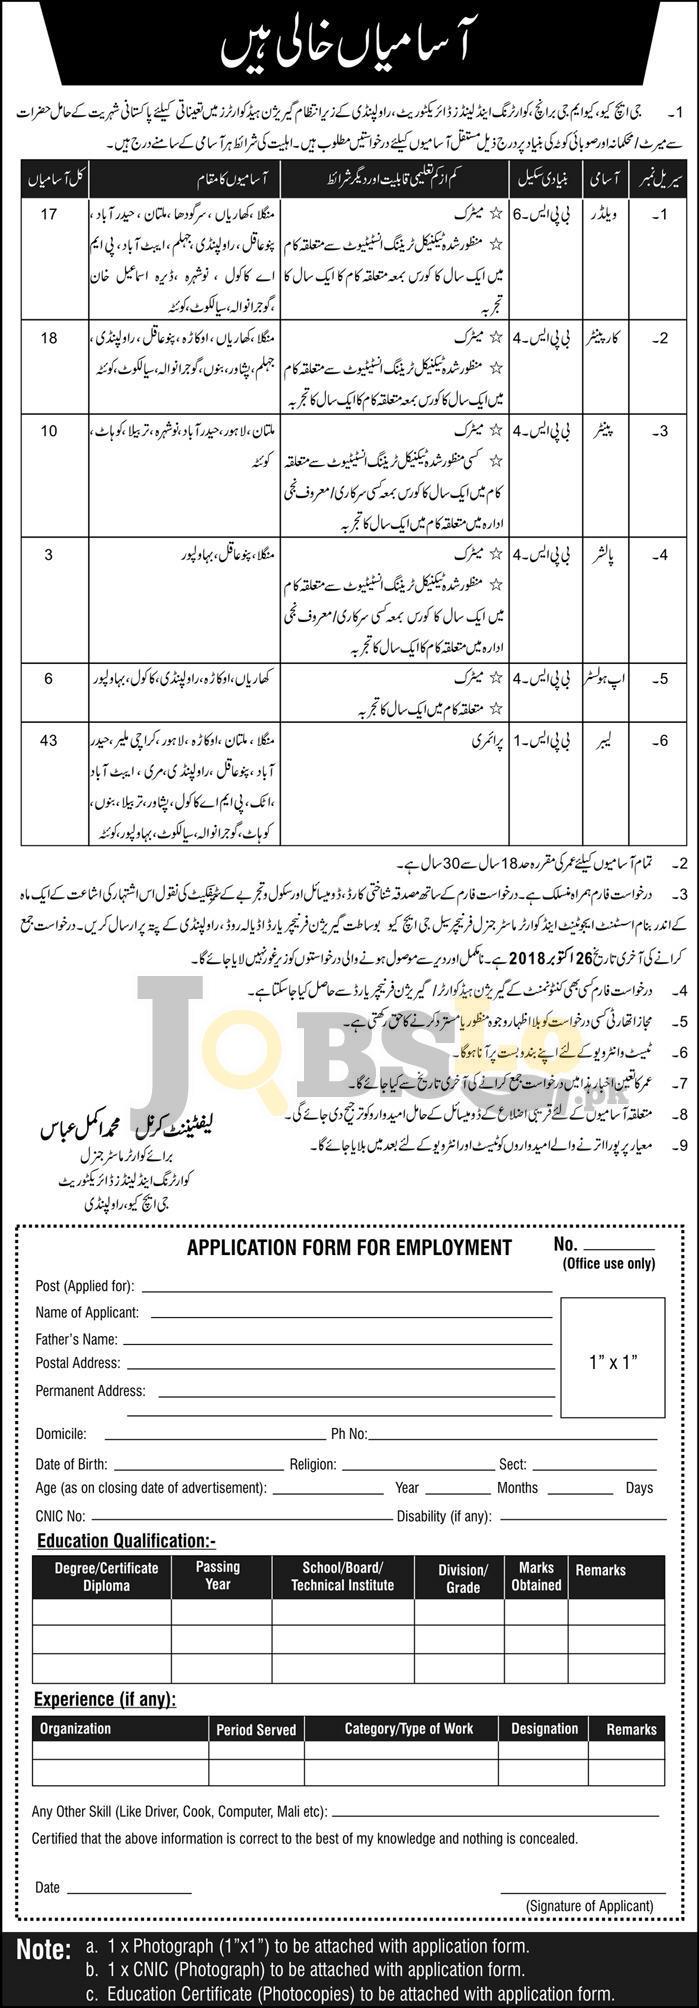 GHQ Rawalpindi Jobs September 2018 Pakistan Army For Welder/Carpenter/Labor